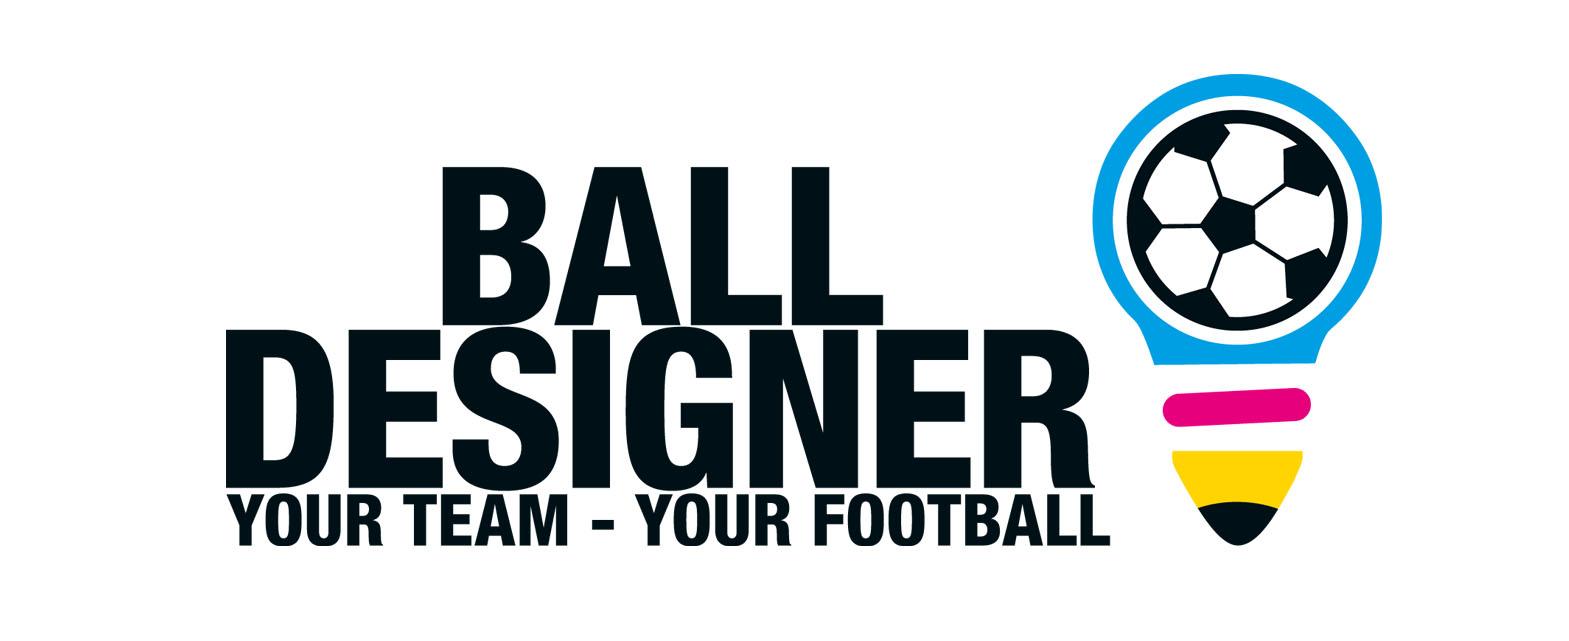 Balldesigner